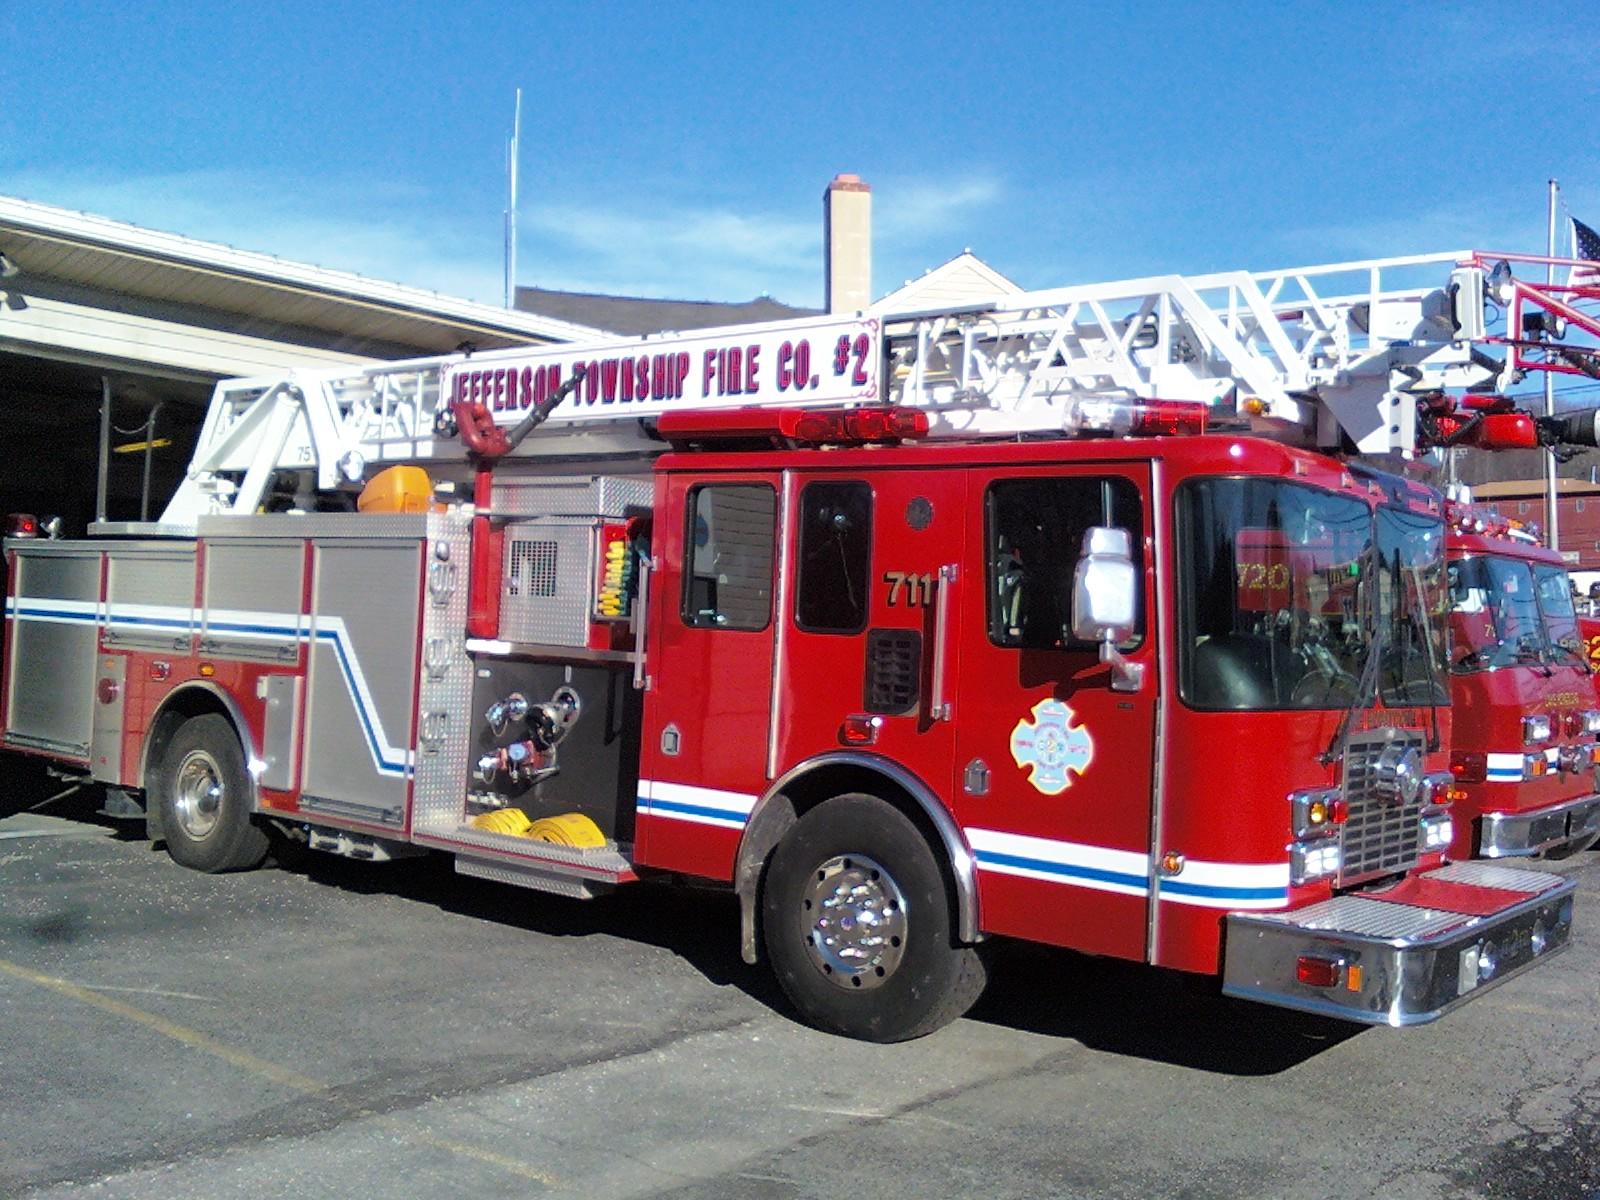 Ladder 711